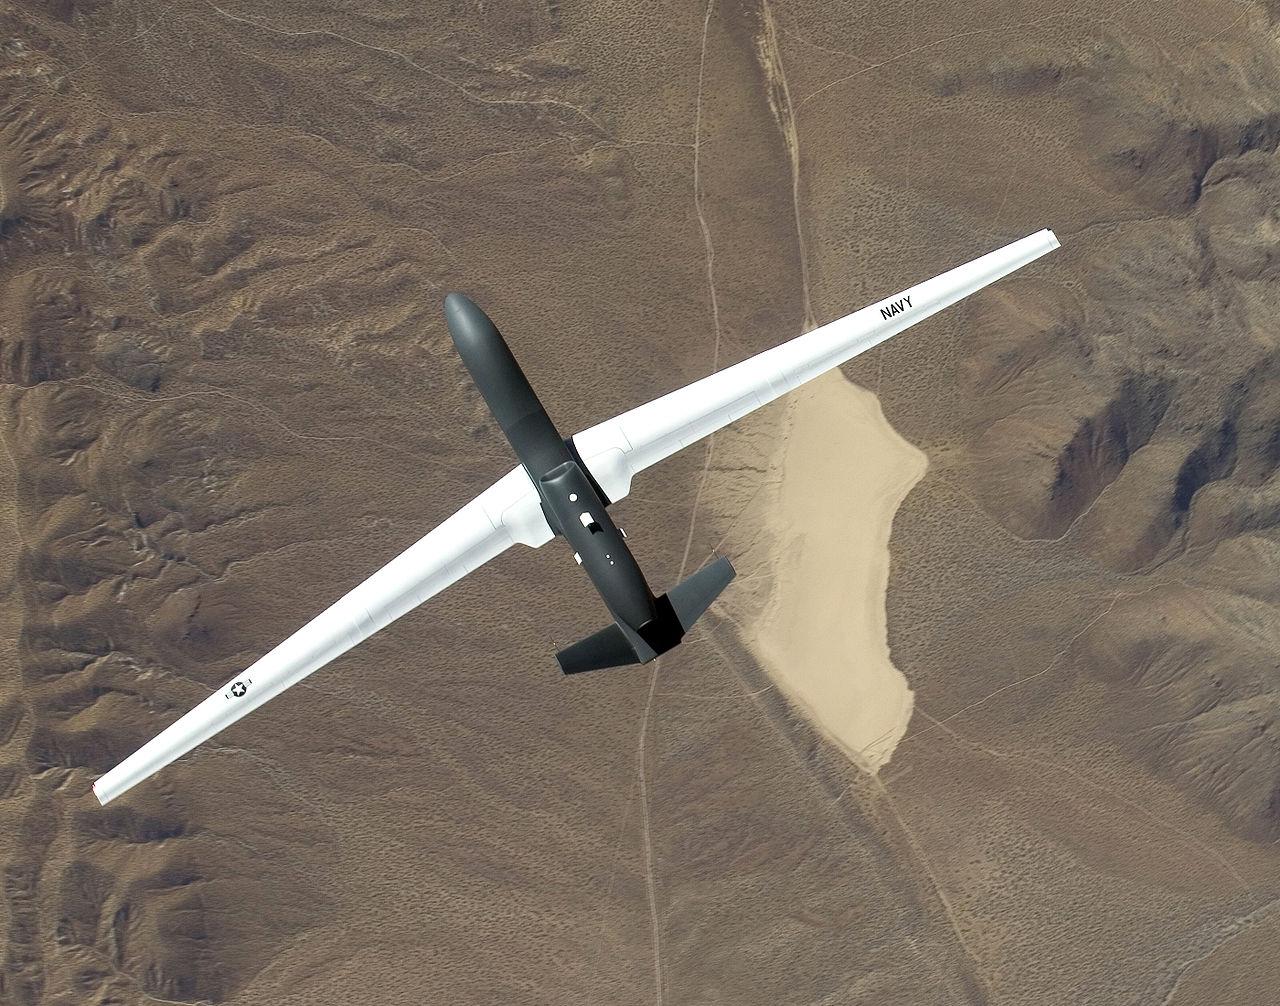 "Drohne RQ-4, ""Stolz der Bundeswehr"". Bild: Jim Gordon. Quelle: Wikimedia Commons. Lizenz: CC BY 2.0."